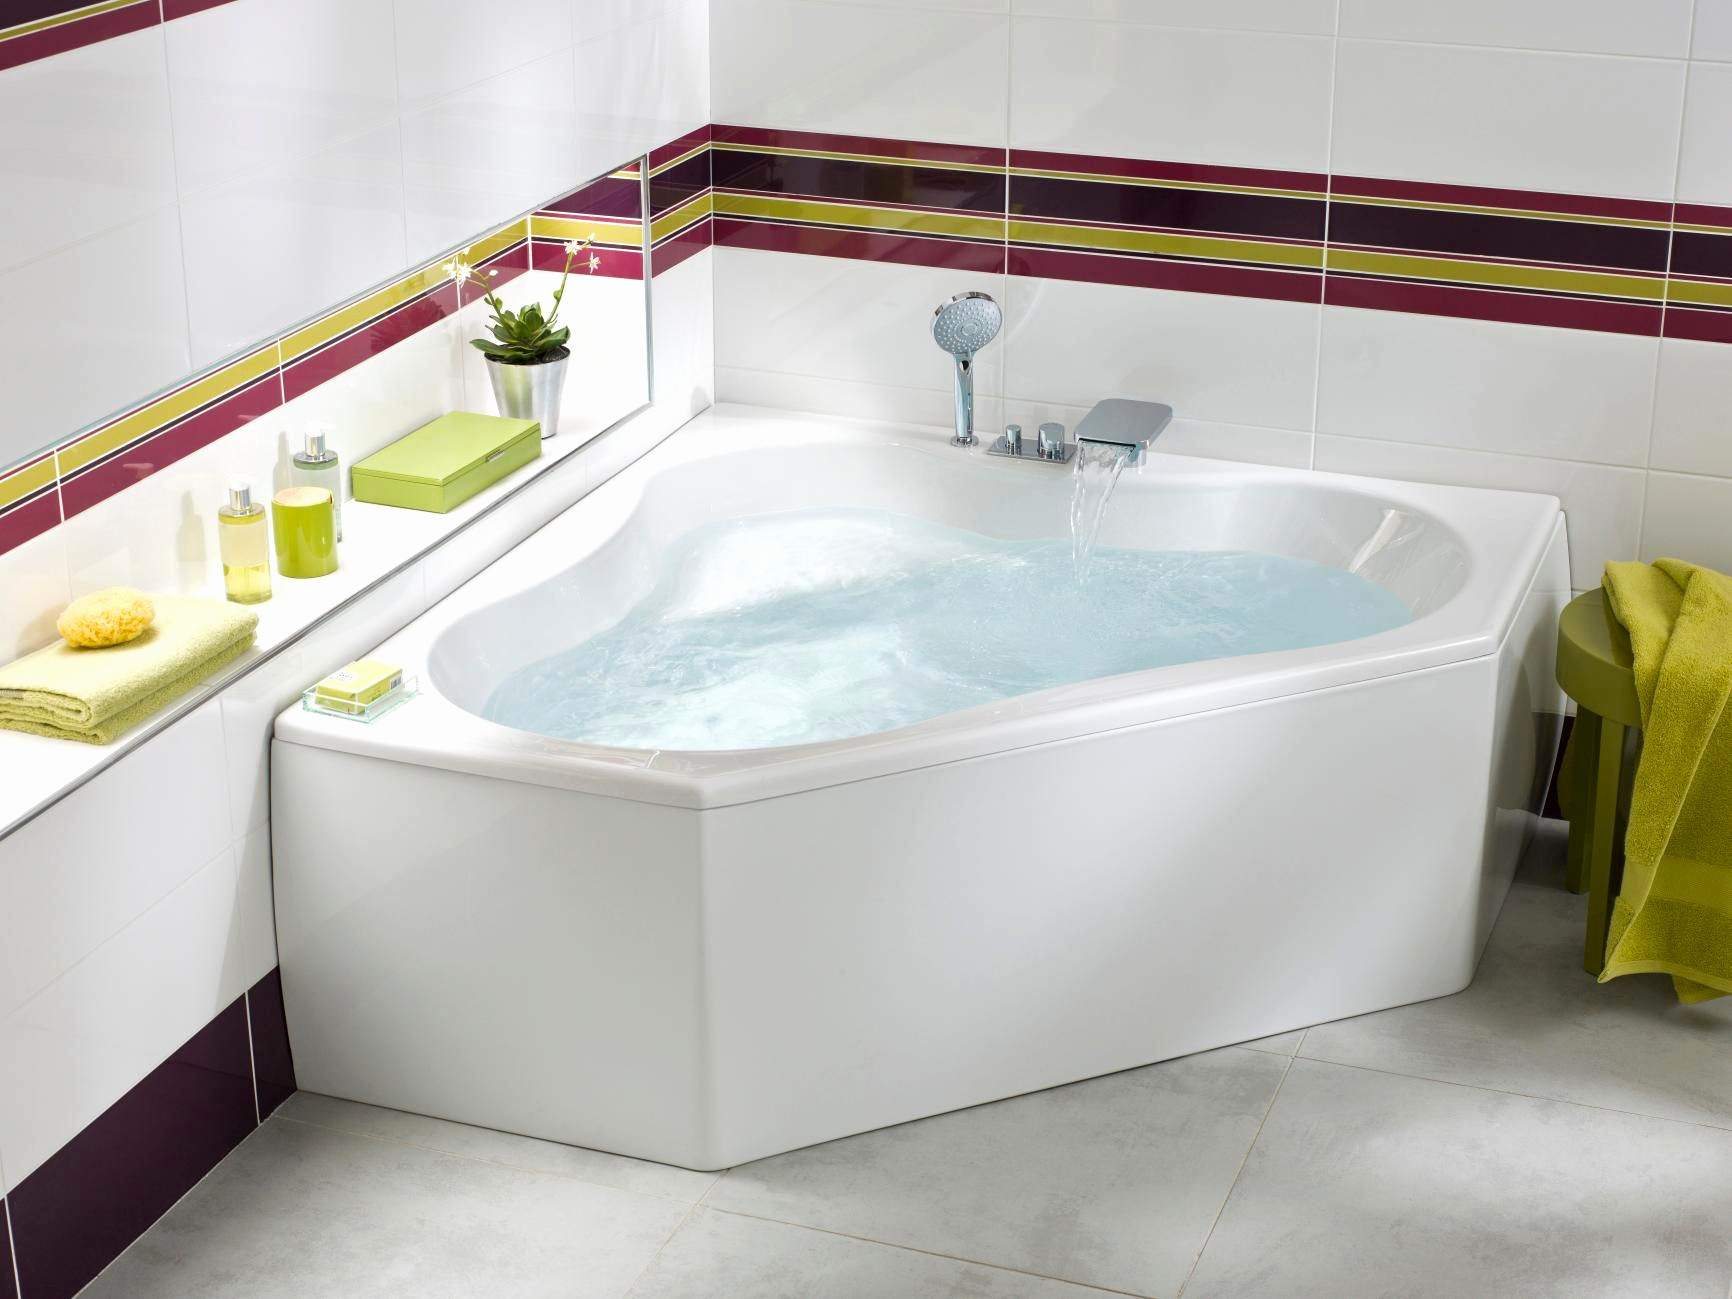 decoupe mousse antibes altoservices. Black Bedroom Furniture Sets. Home Design Ideas